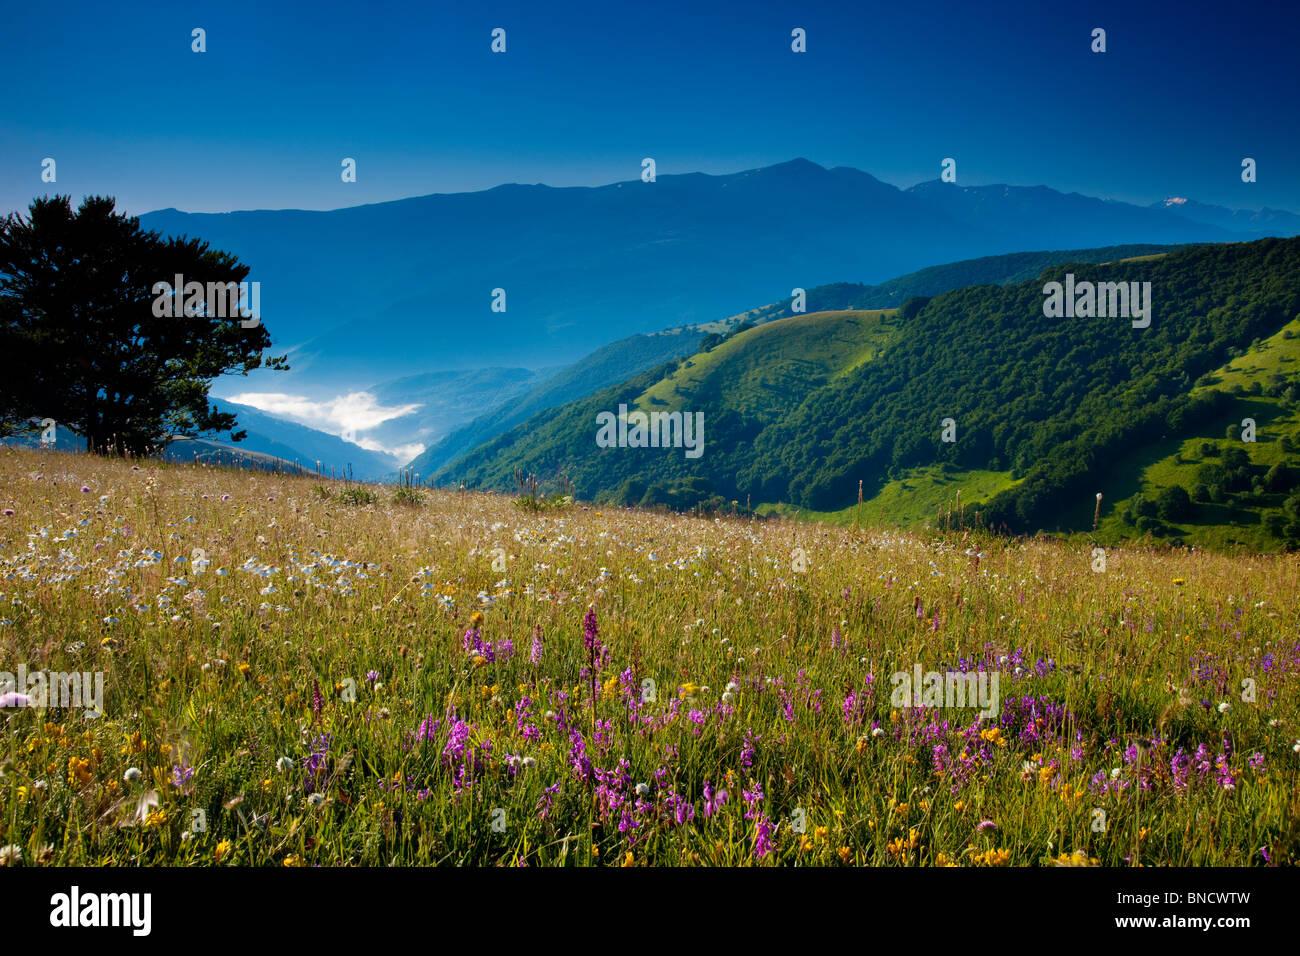 Wildblumen im Morgengrauen entlang der Forca Canapine in den Monti Sibillini Nationalpark, Umbrien Italien Stockbild